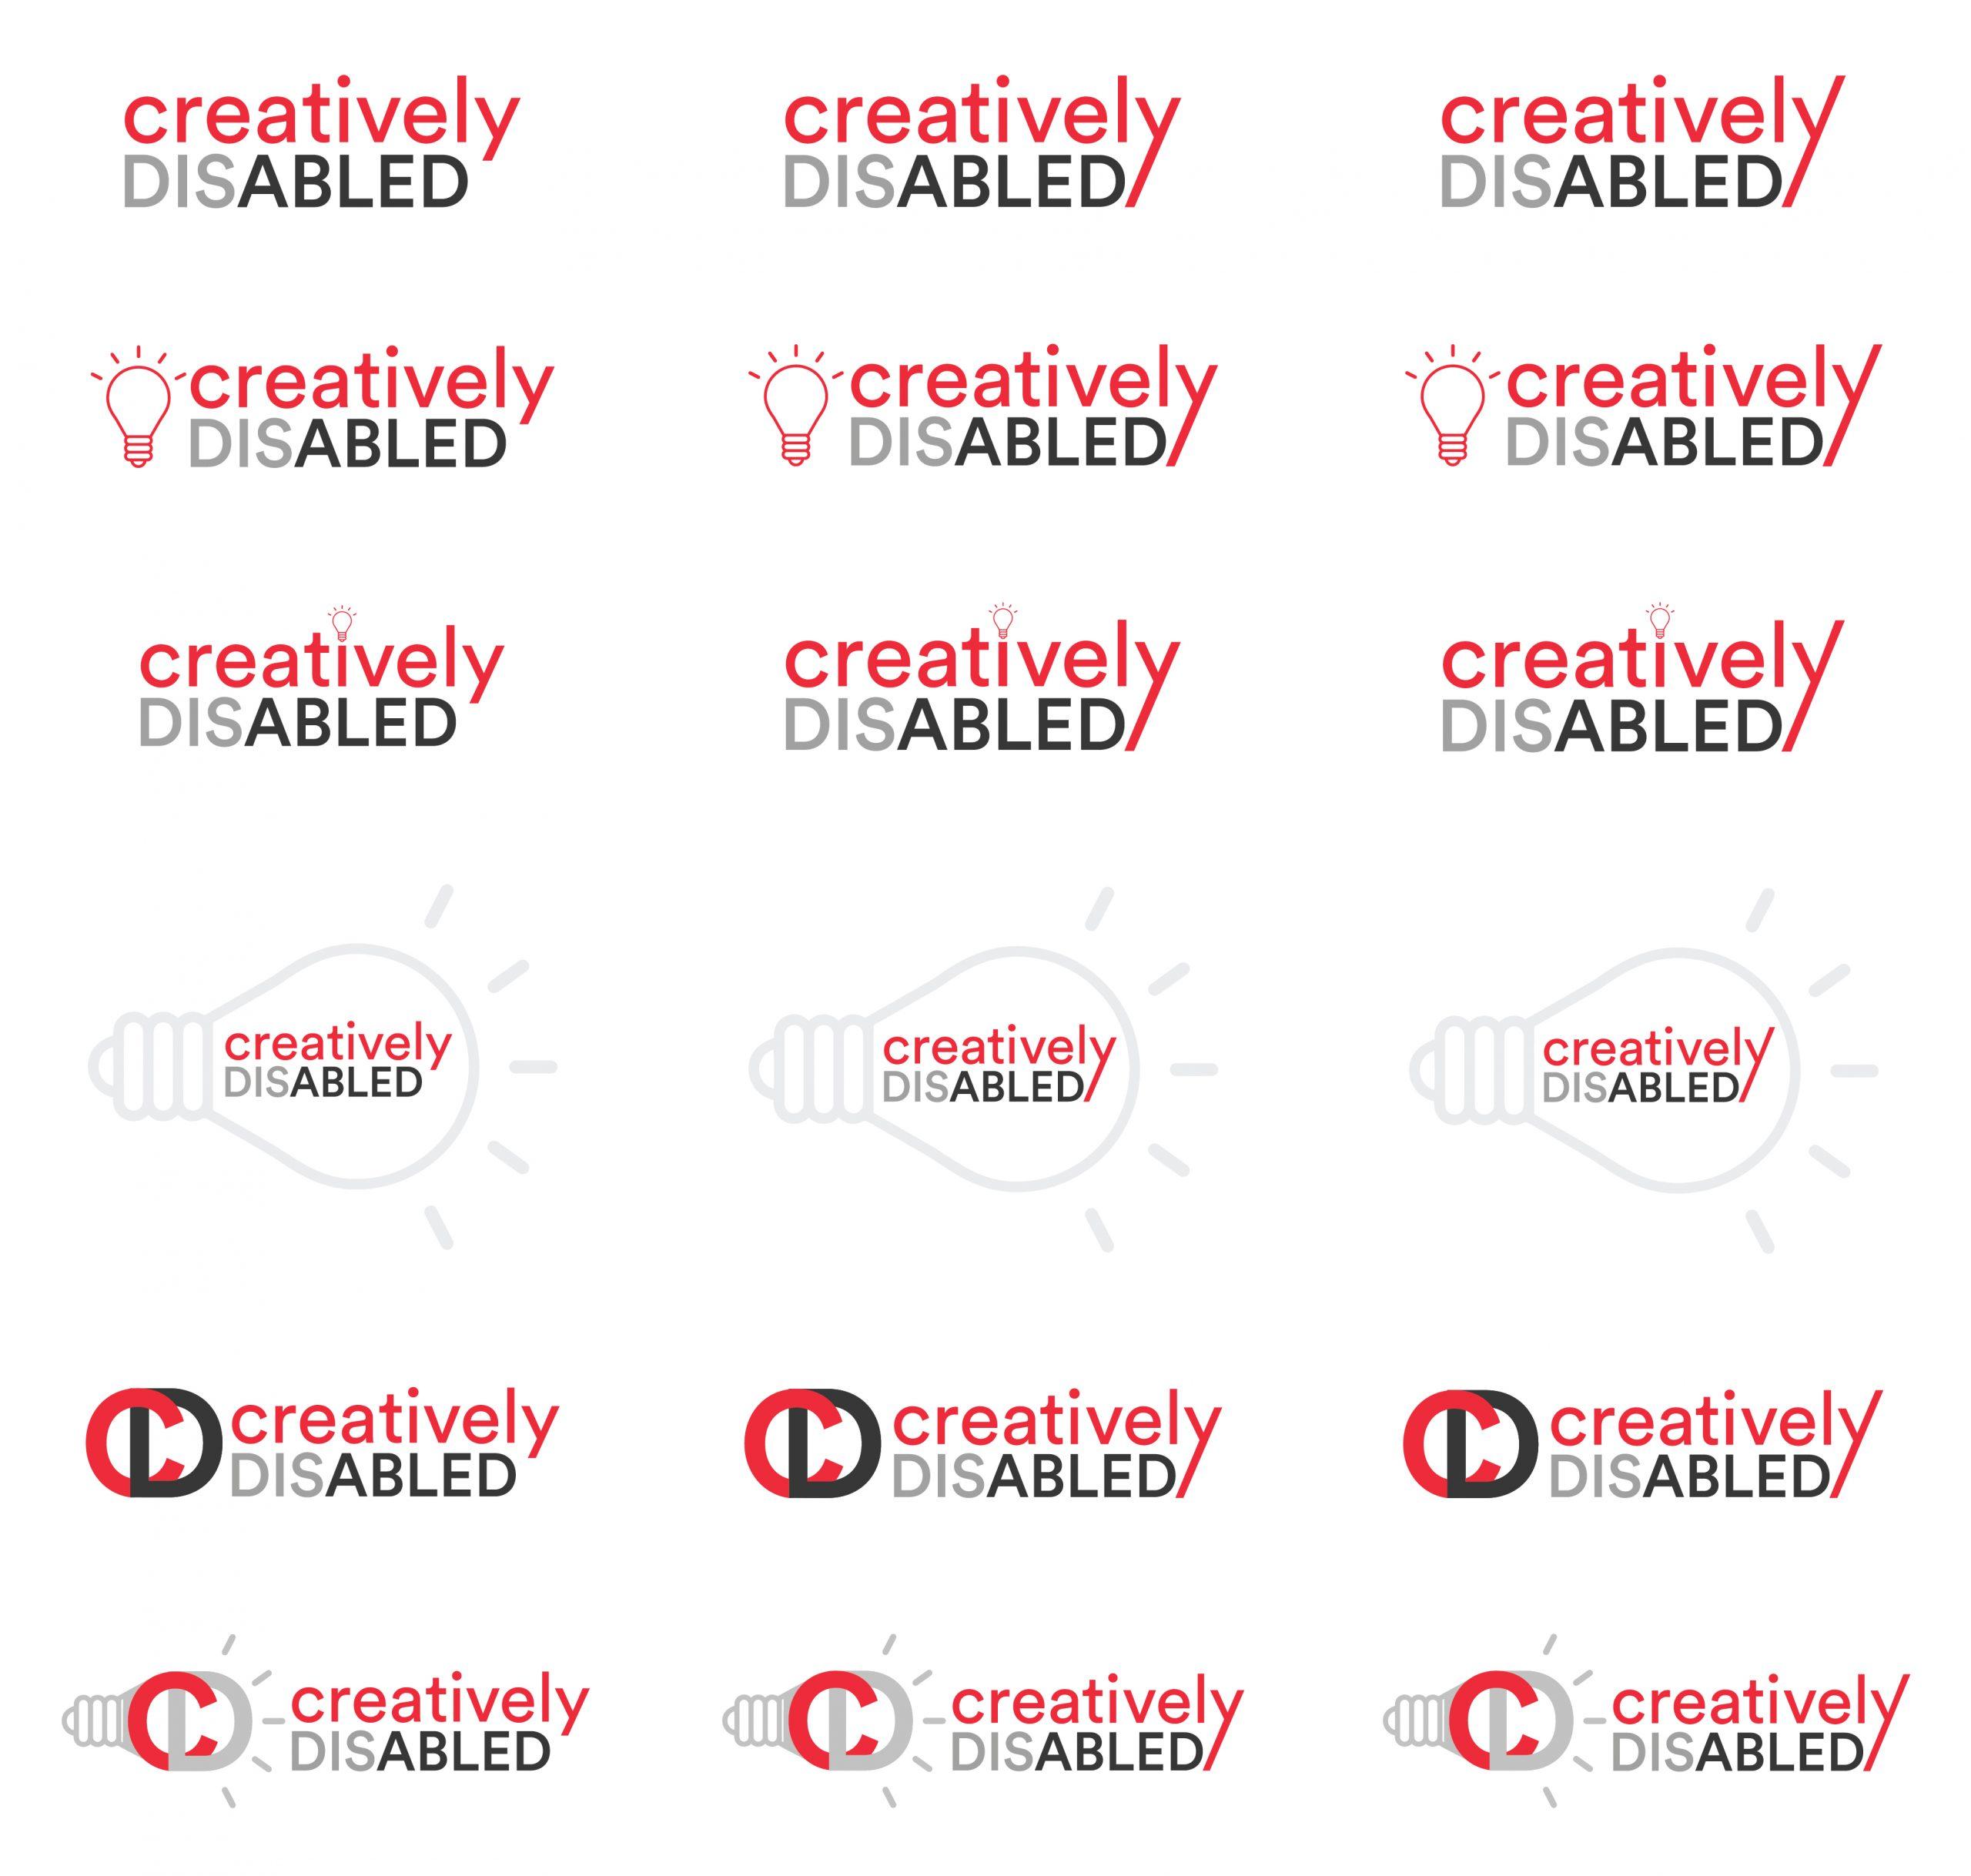 Logo design ideas for creatively disabled program